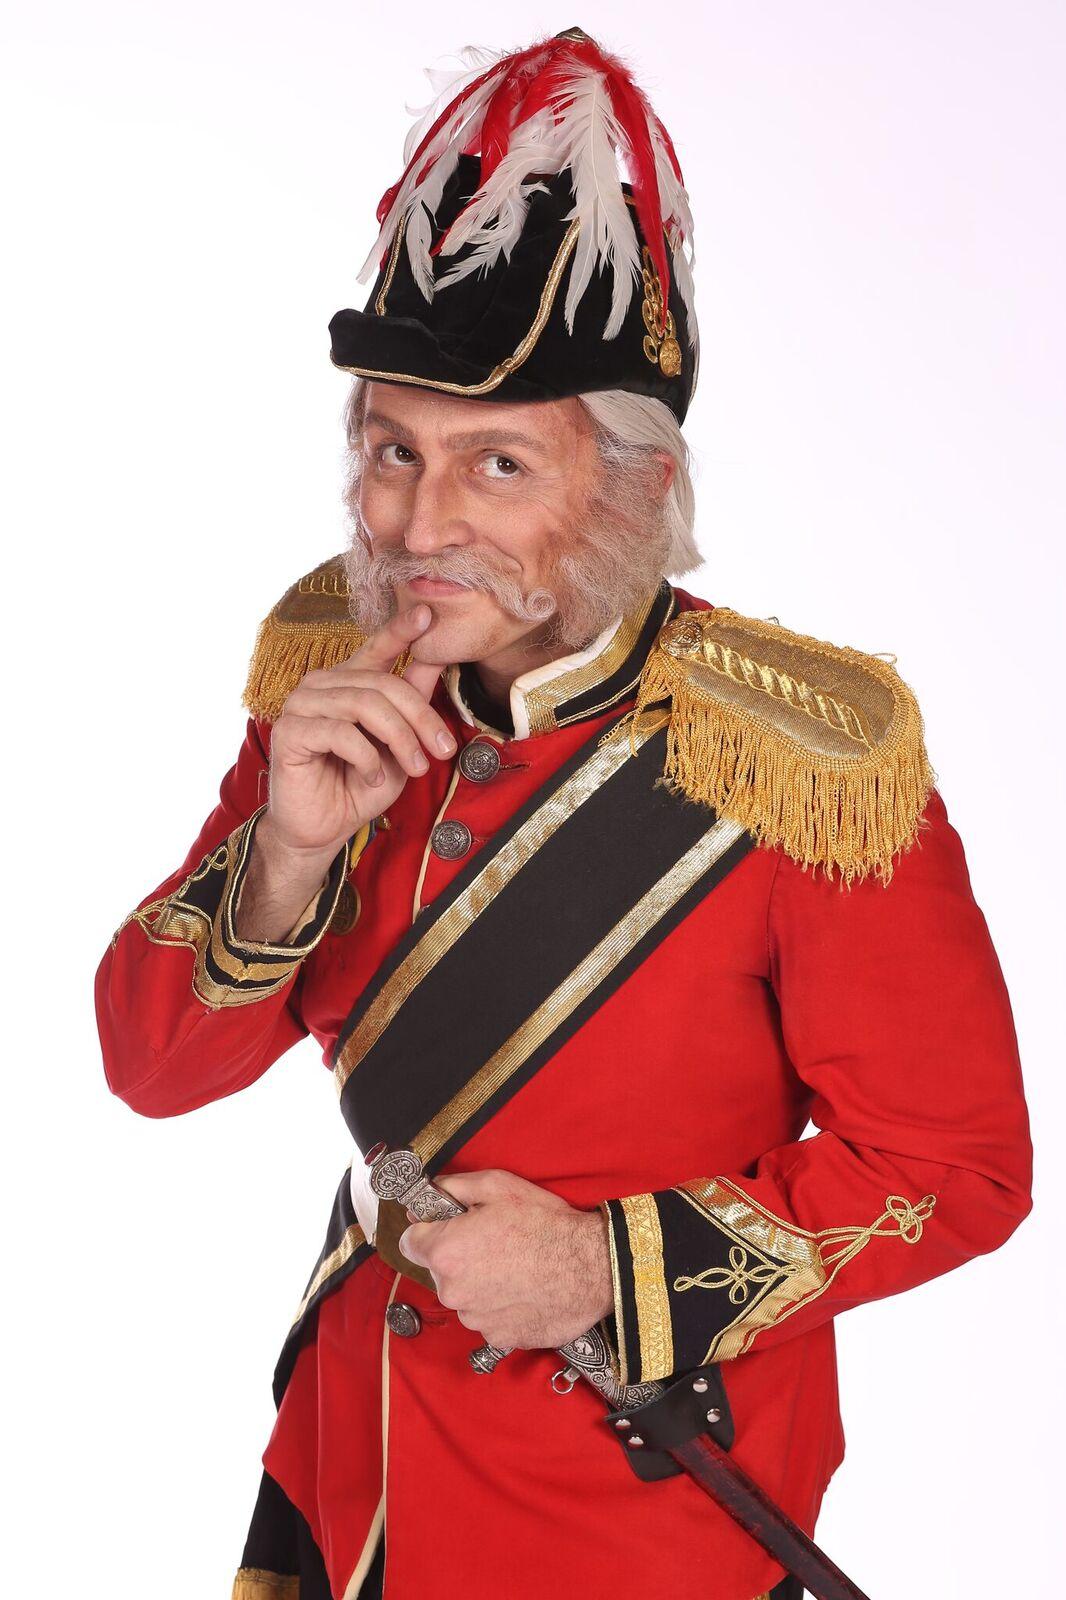 Major General Stanley